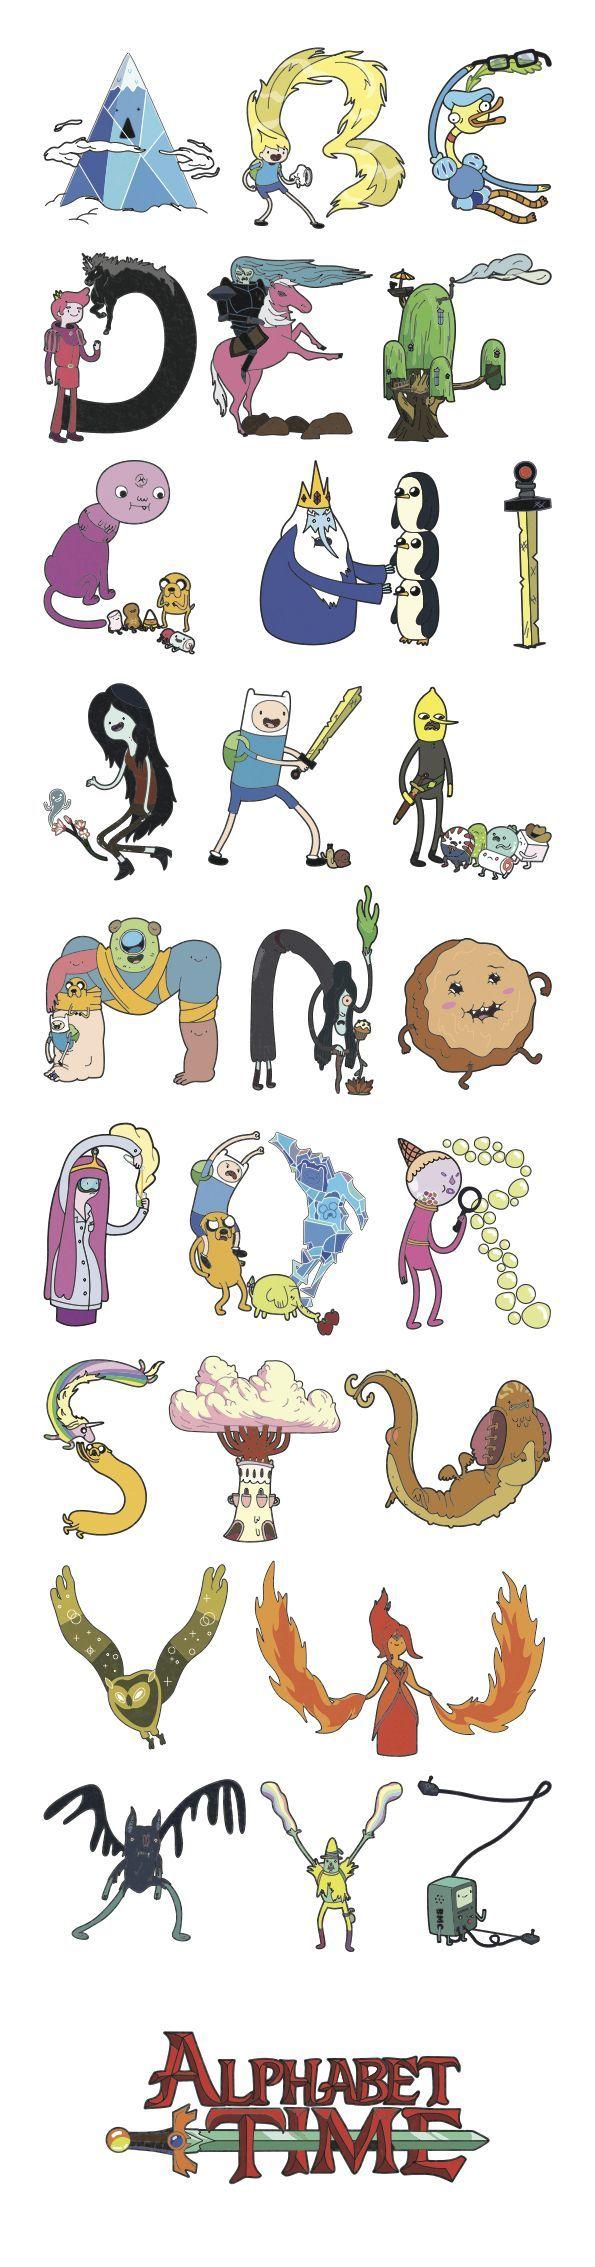 Adventure Time Alphabet By Jobi Gutierrez Via Behance